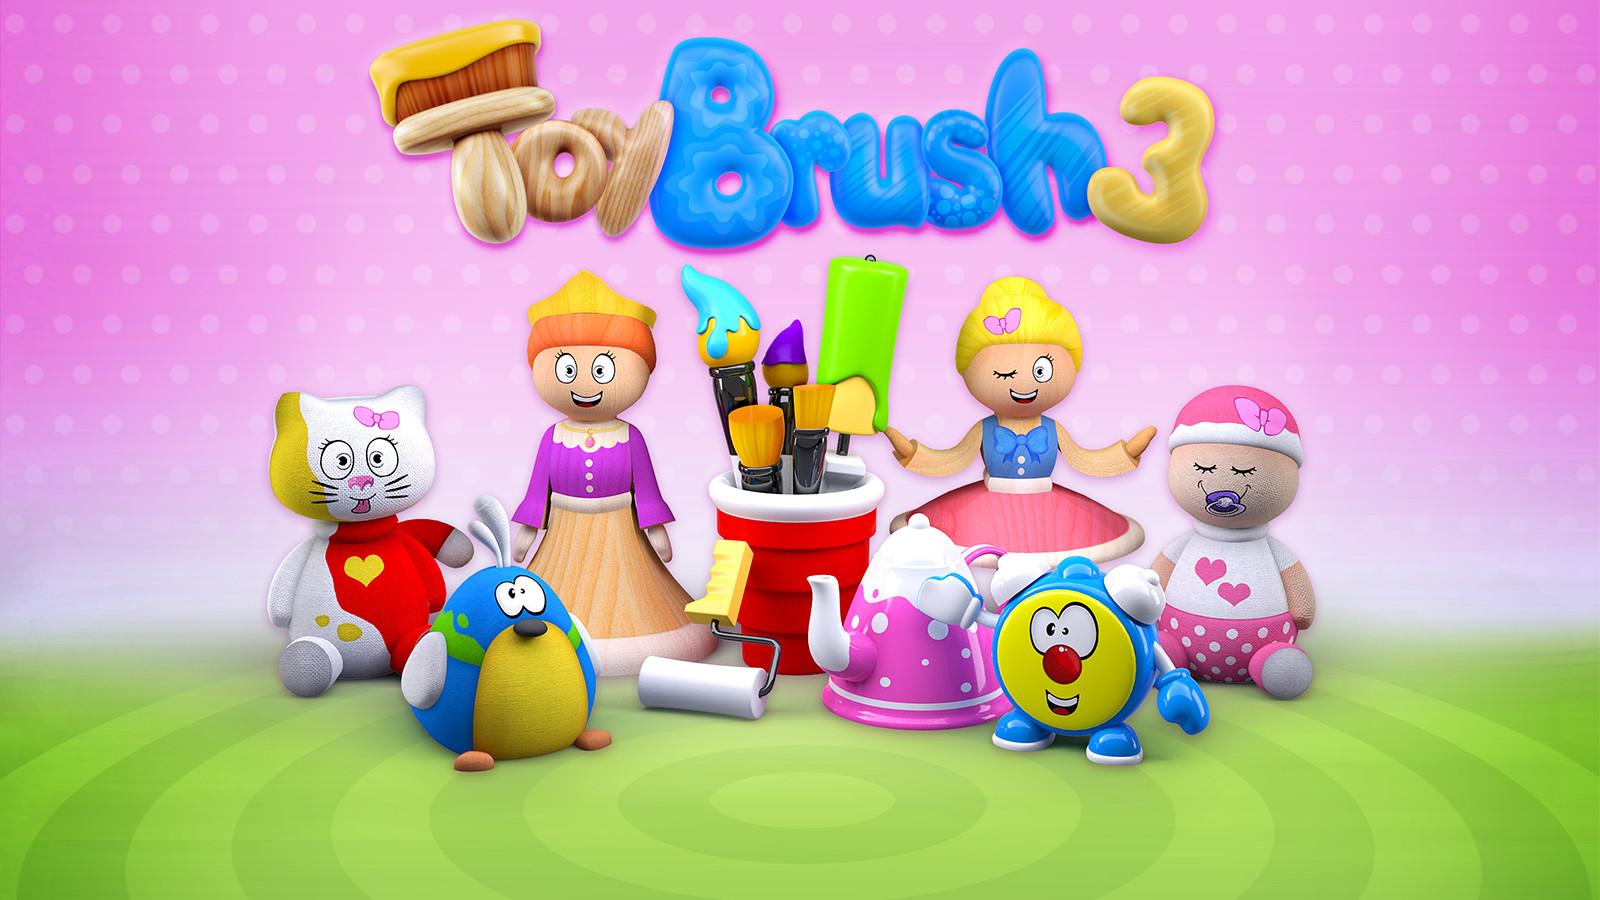 ToyBrush 3D